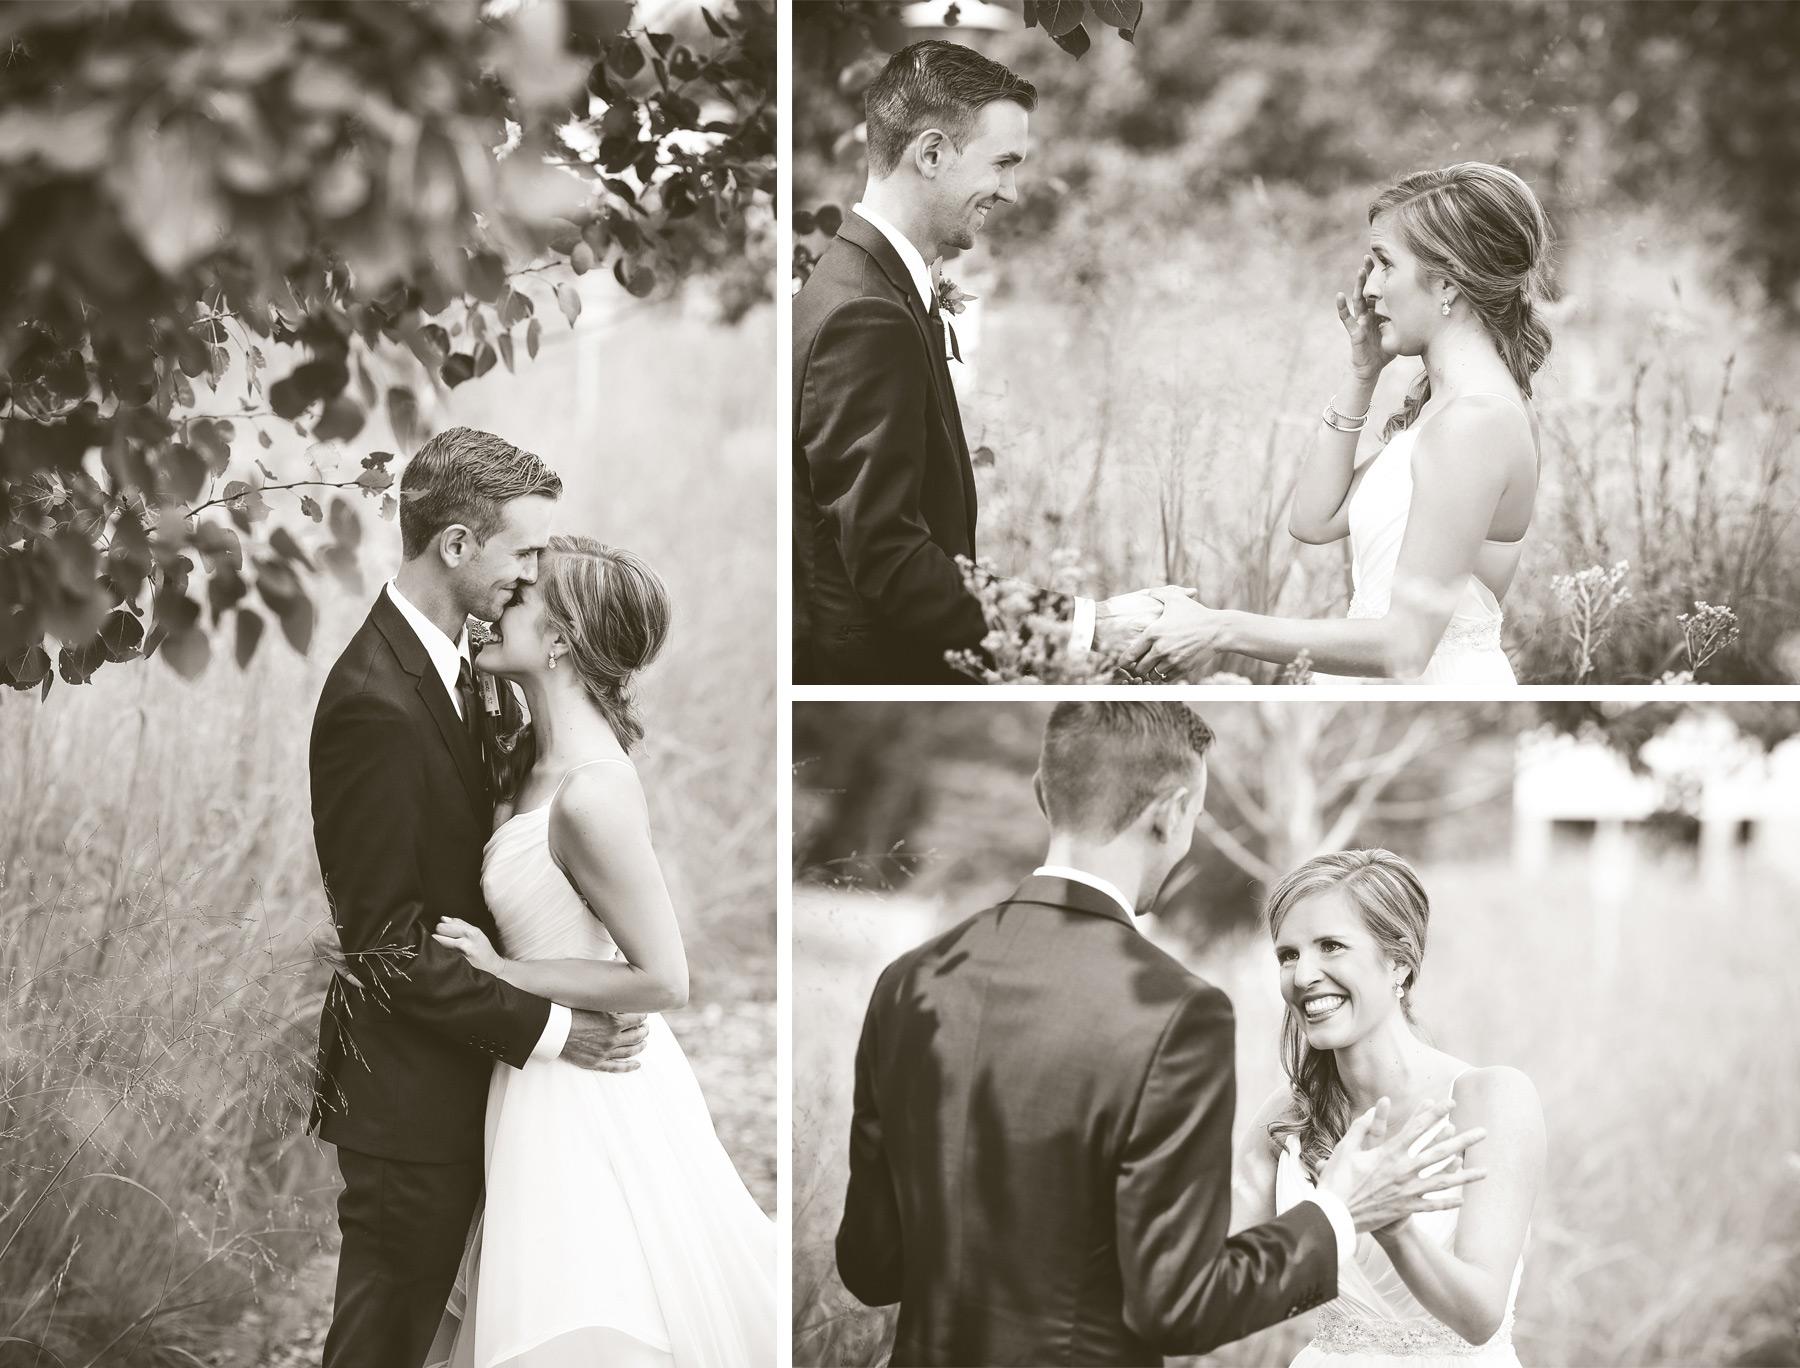 04-Minneapolis-Minnesota-Wedding-Photography-by-Vick-Photography-Field-First-Look-Jess-&-Jake.jpg